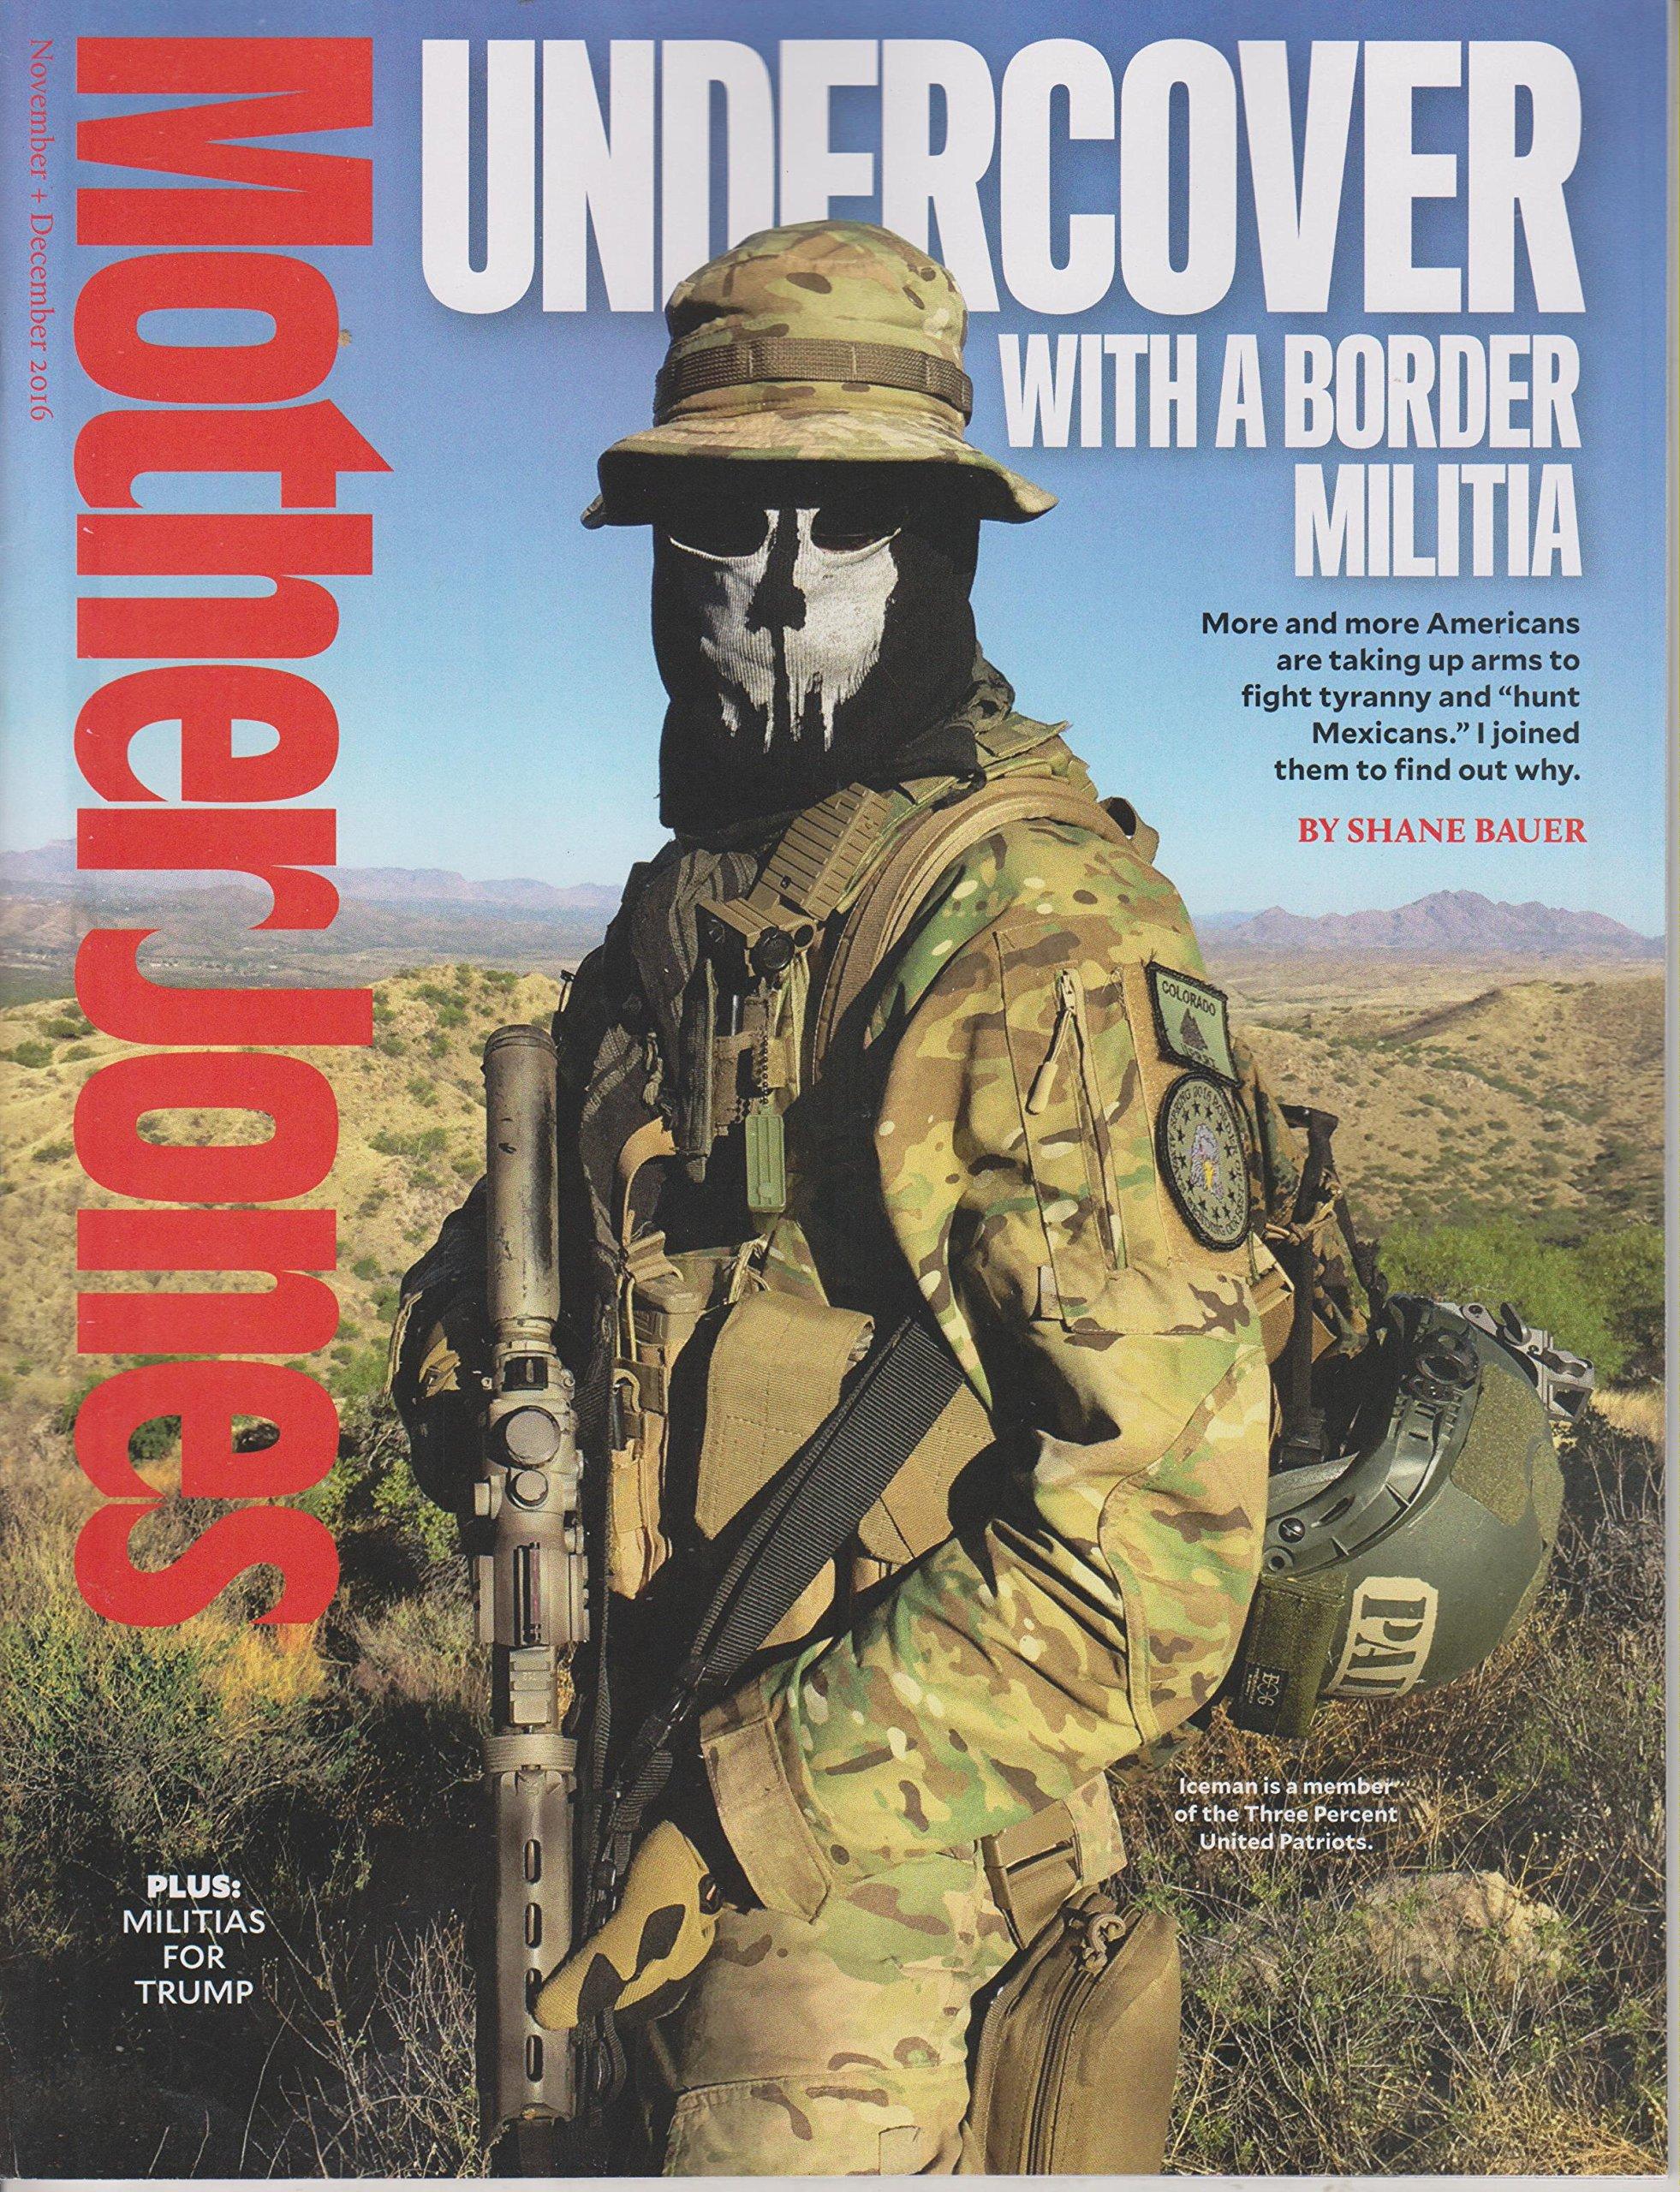 Download Mother Jones November / December Undercover With a Border Militia PDF ePub book